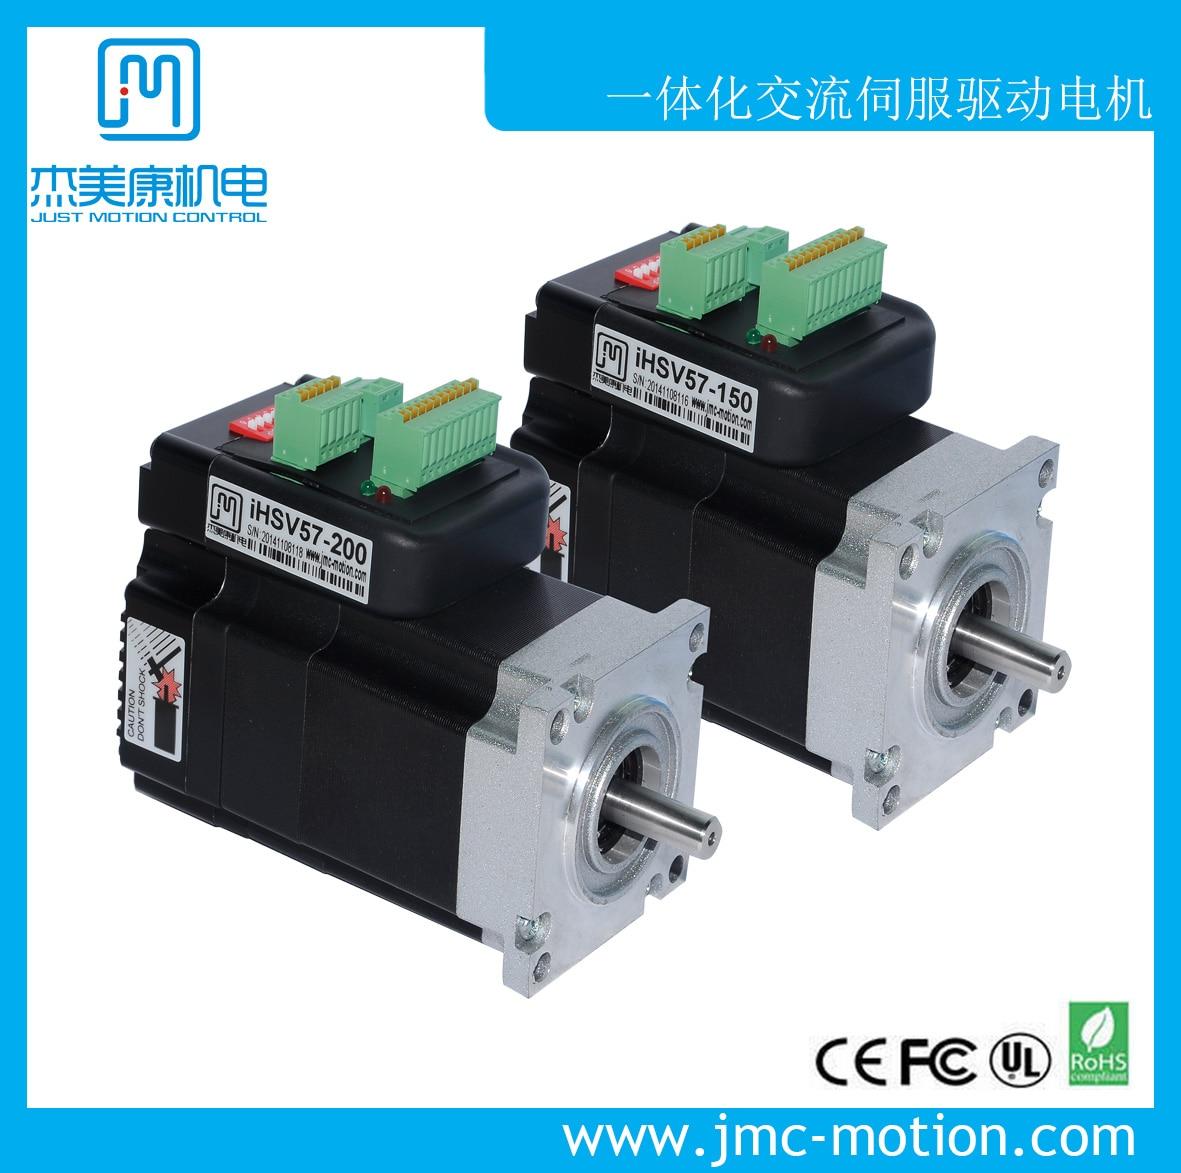 все цены на  140W, integrated AC servo drive motor, IHSV57-30-14-36, large torque, not lost step  онлайн